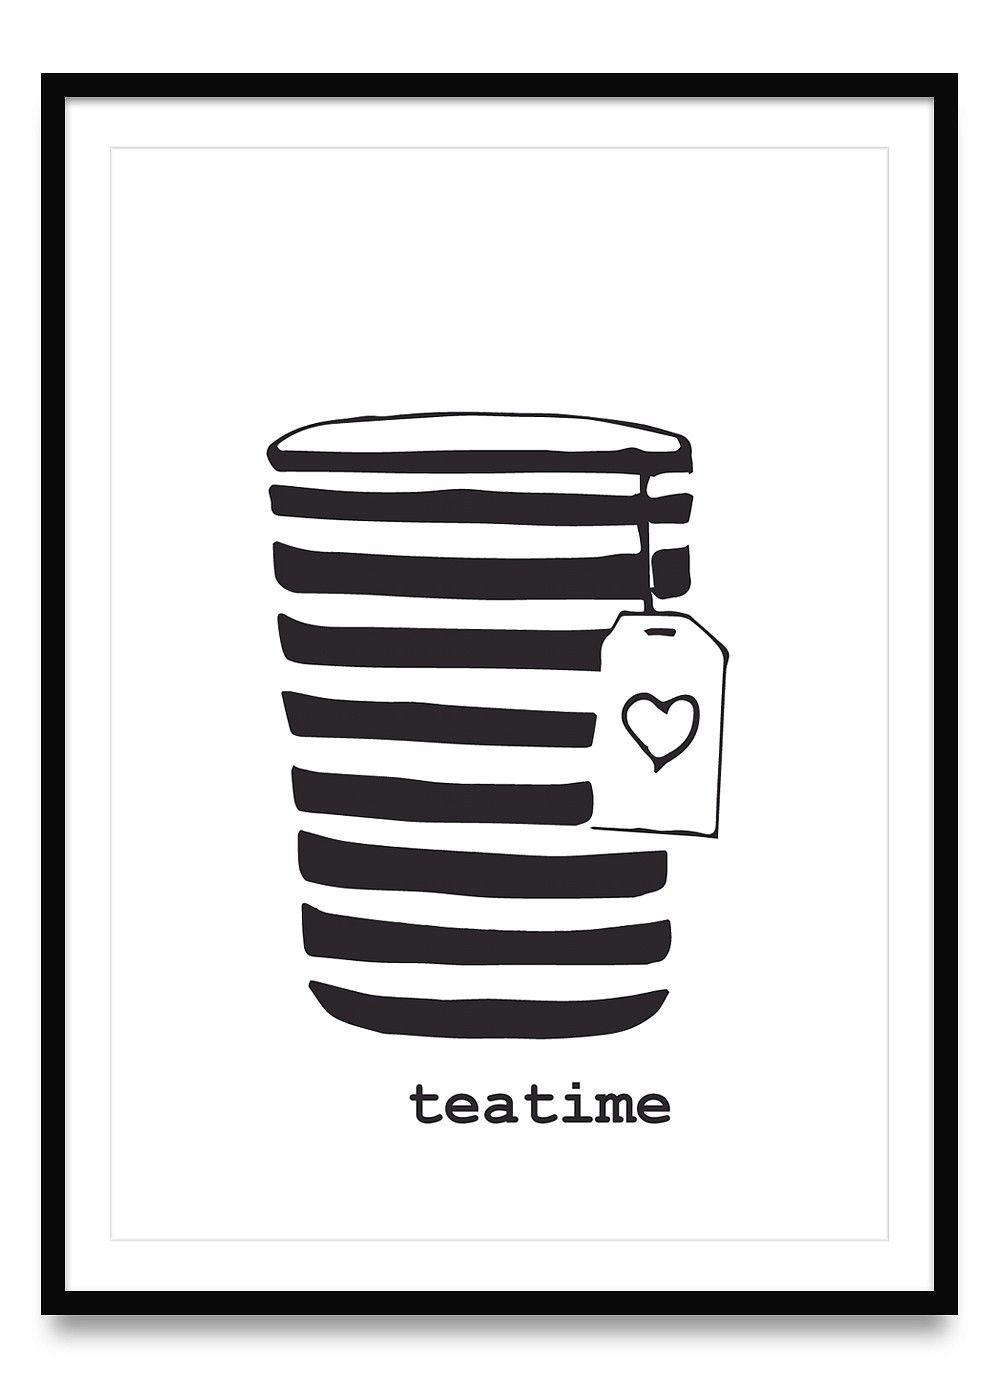 Teatime - Poster